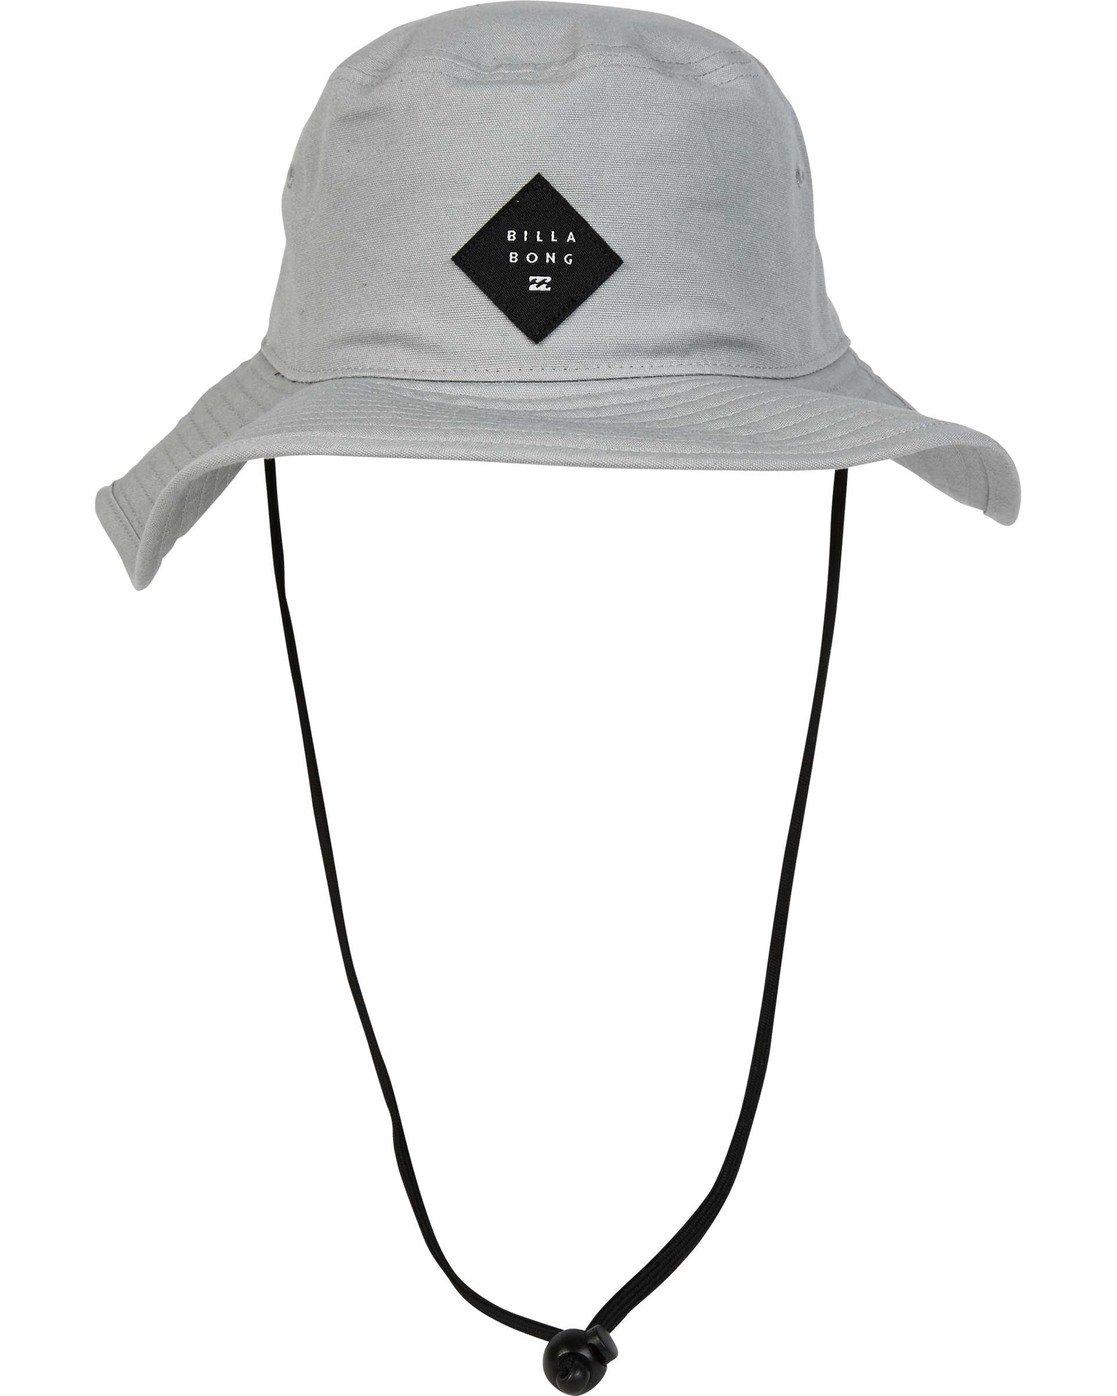 Billabong Big John Bucket Hat STN OS 828570257149  6bce8f10a4c